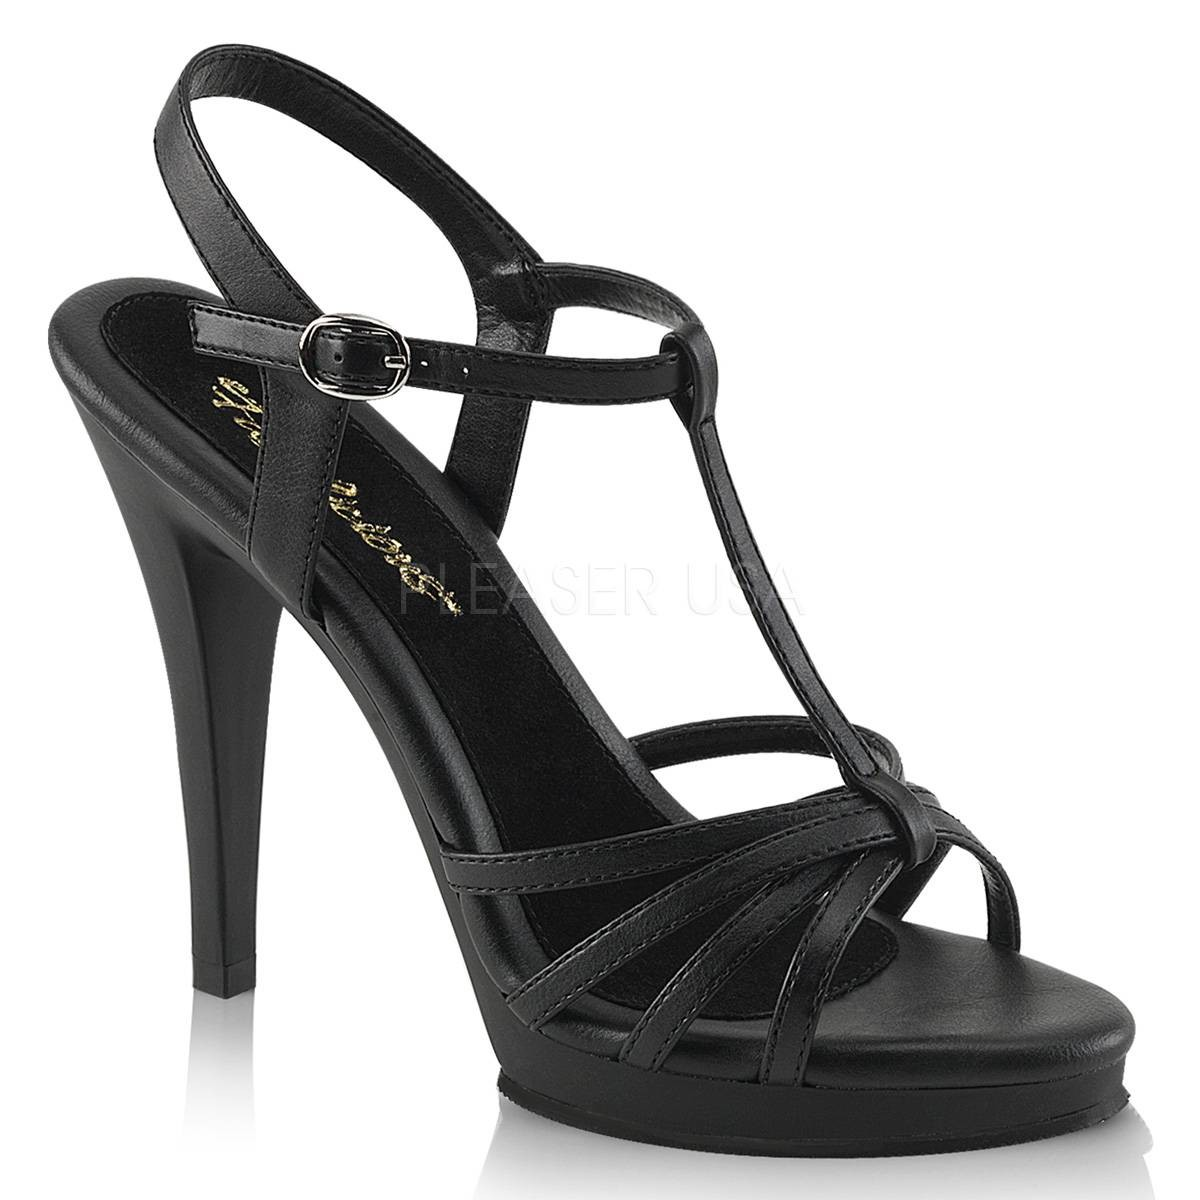 Sandalen - FLAIR 420 ° Damen Sandalette ° SchwarzMatt ° Fabulicious  - Onlineshop RedSixty